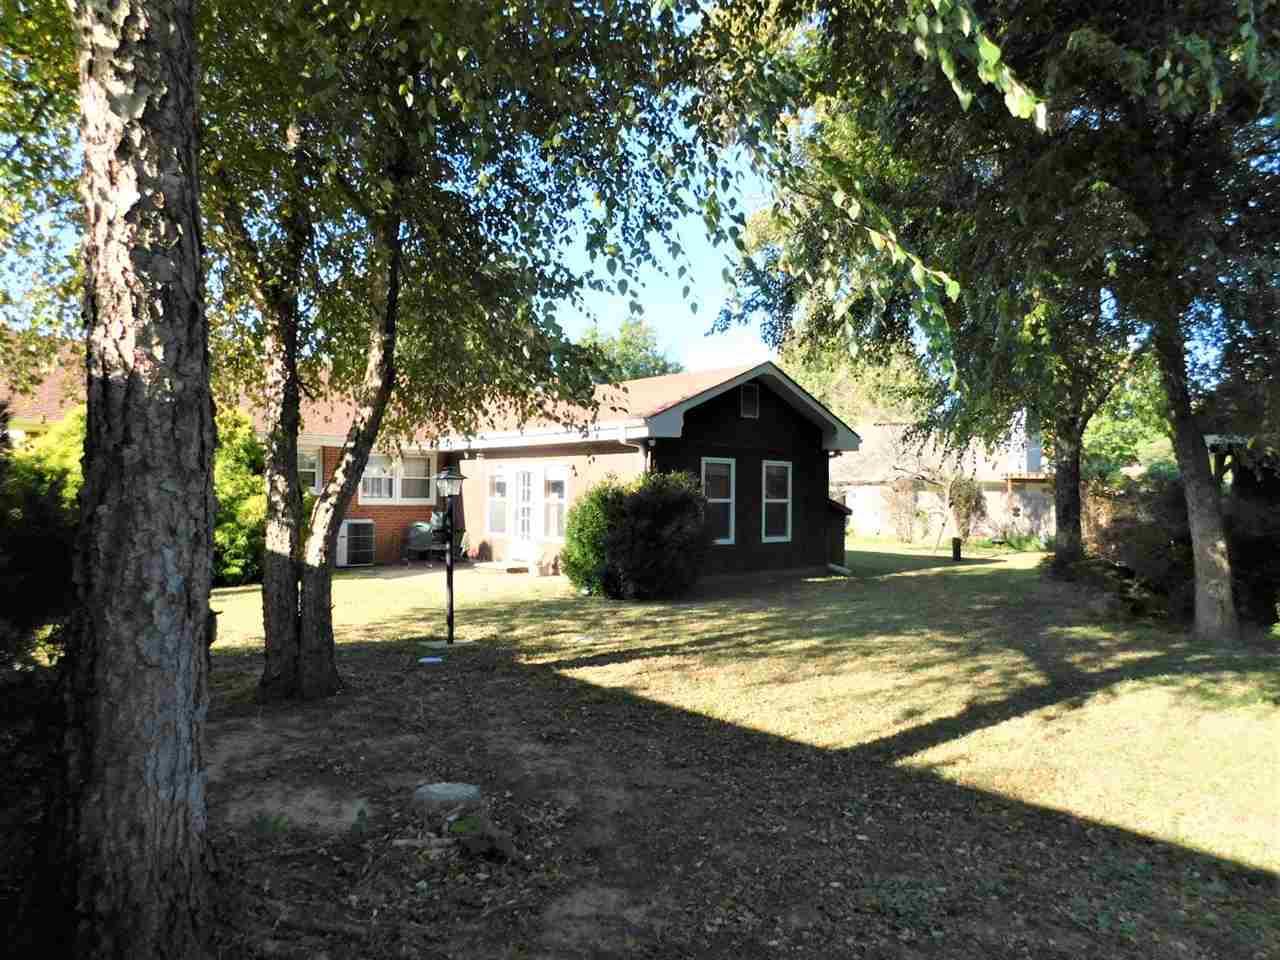 #century21groupone,#homesforsaleponcacity,#poncacityrealestate | 2415 Mockingbird  Ponca City, OK 74604 24